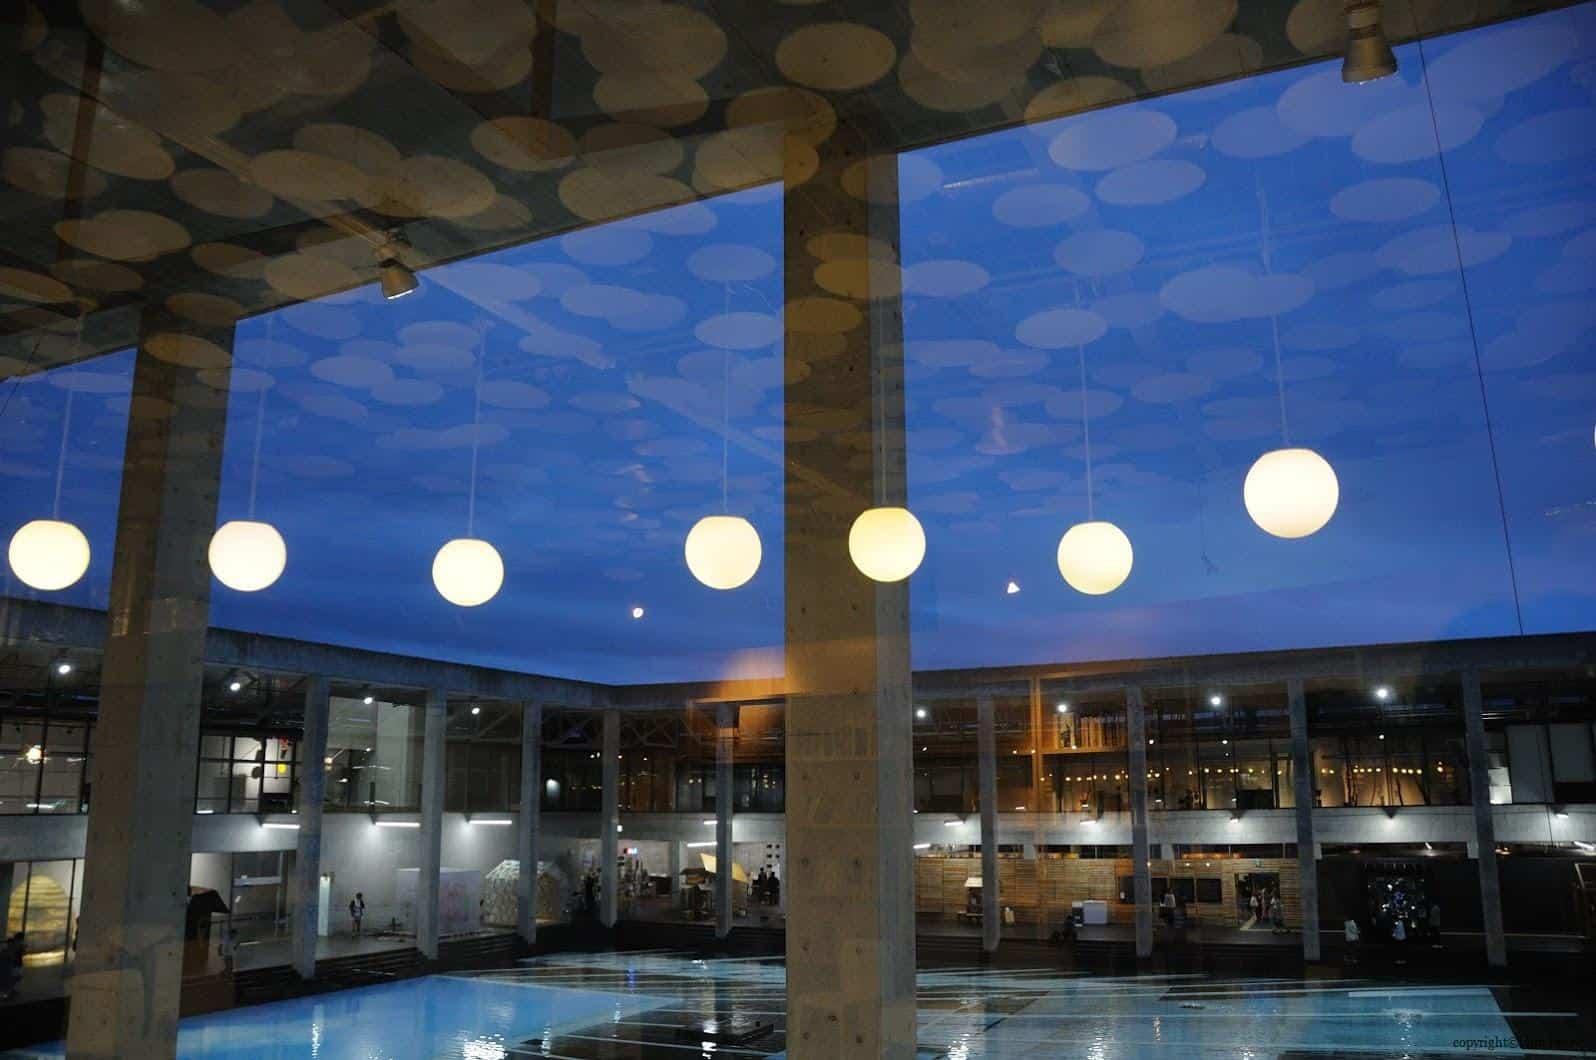 原廣司+ATELIER建築研究所,越後妻有里山現代美術館,咖啡廳天花板上的圈圈為義大利藝術家Massimo Bartolini feat. Lorenzo Bini(マッシモ・バルトリーニfeat. ロレンツォ・ビニ)的作品《○in□》,在夜晚透過玻璃倒映在上的影子疊在外面的空間時,如同白天雲朵投射在美術館中 越後妻有里山現代美術館 越後妻有里山現代美術館 echigo tsumari kouryukan echigo tsumari exchange center 19